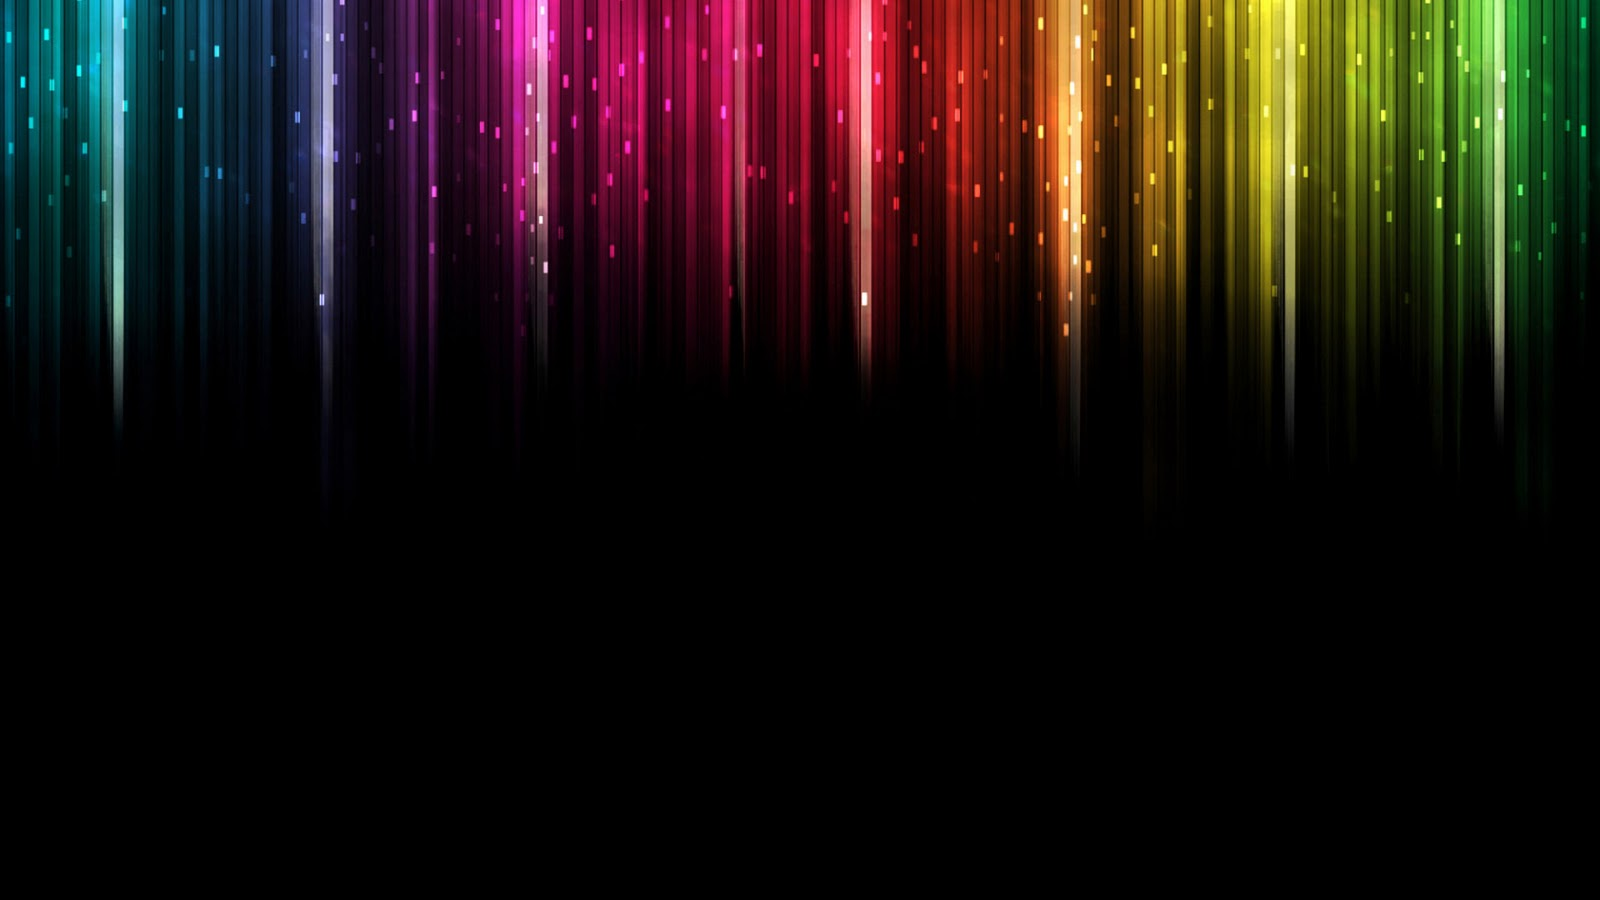 http://1.bp.blogspot.com/-VTkGcJ7MbvM/Truzf-I3F0I/AAAAAAAARAU/e_D4NR8SJsU/s1600/Mooie-windows-achtergronden-leuke-hd-windows-wallpapers-afbeelding-plaatje-13.jpg